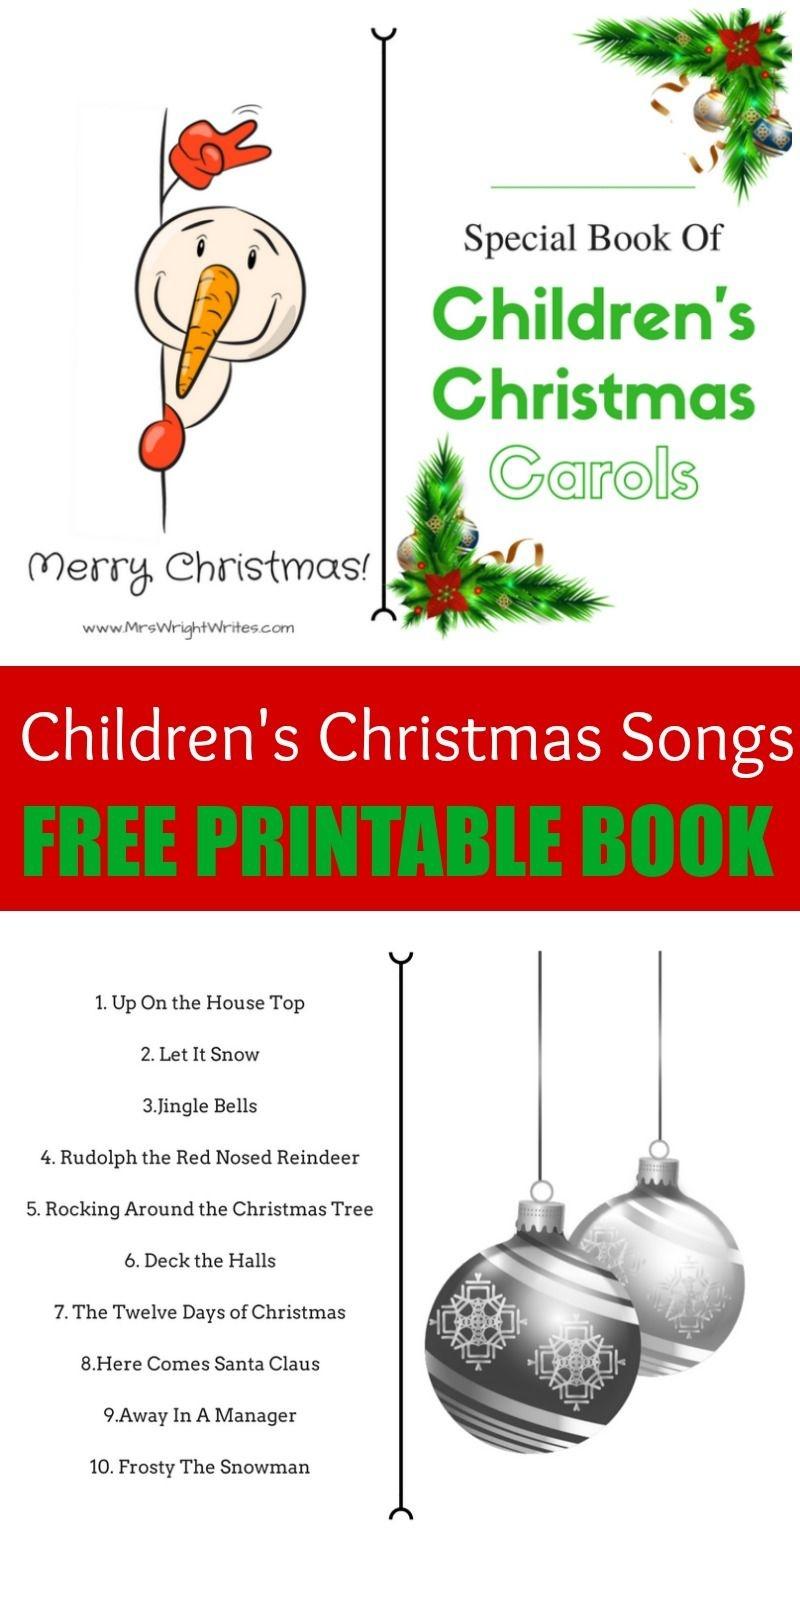 The Best Children's Christmas Songs - Free Printable Book - Free Printable Christmas Carols Booklet